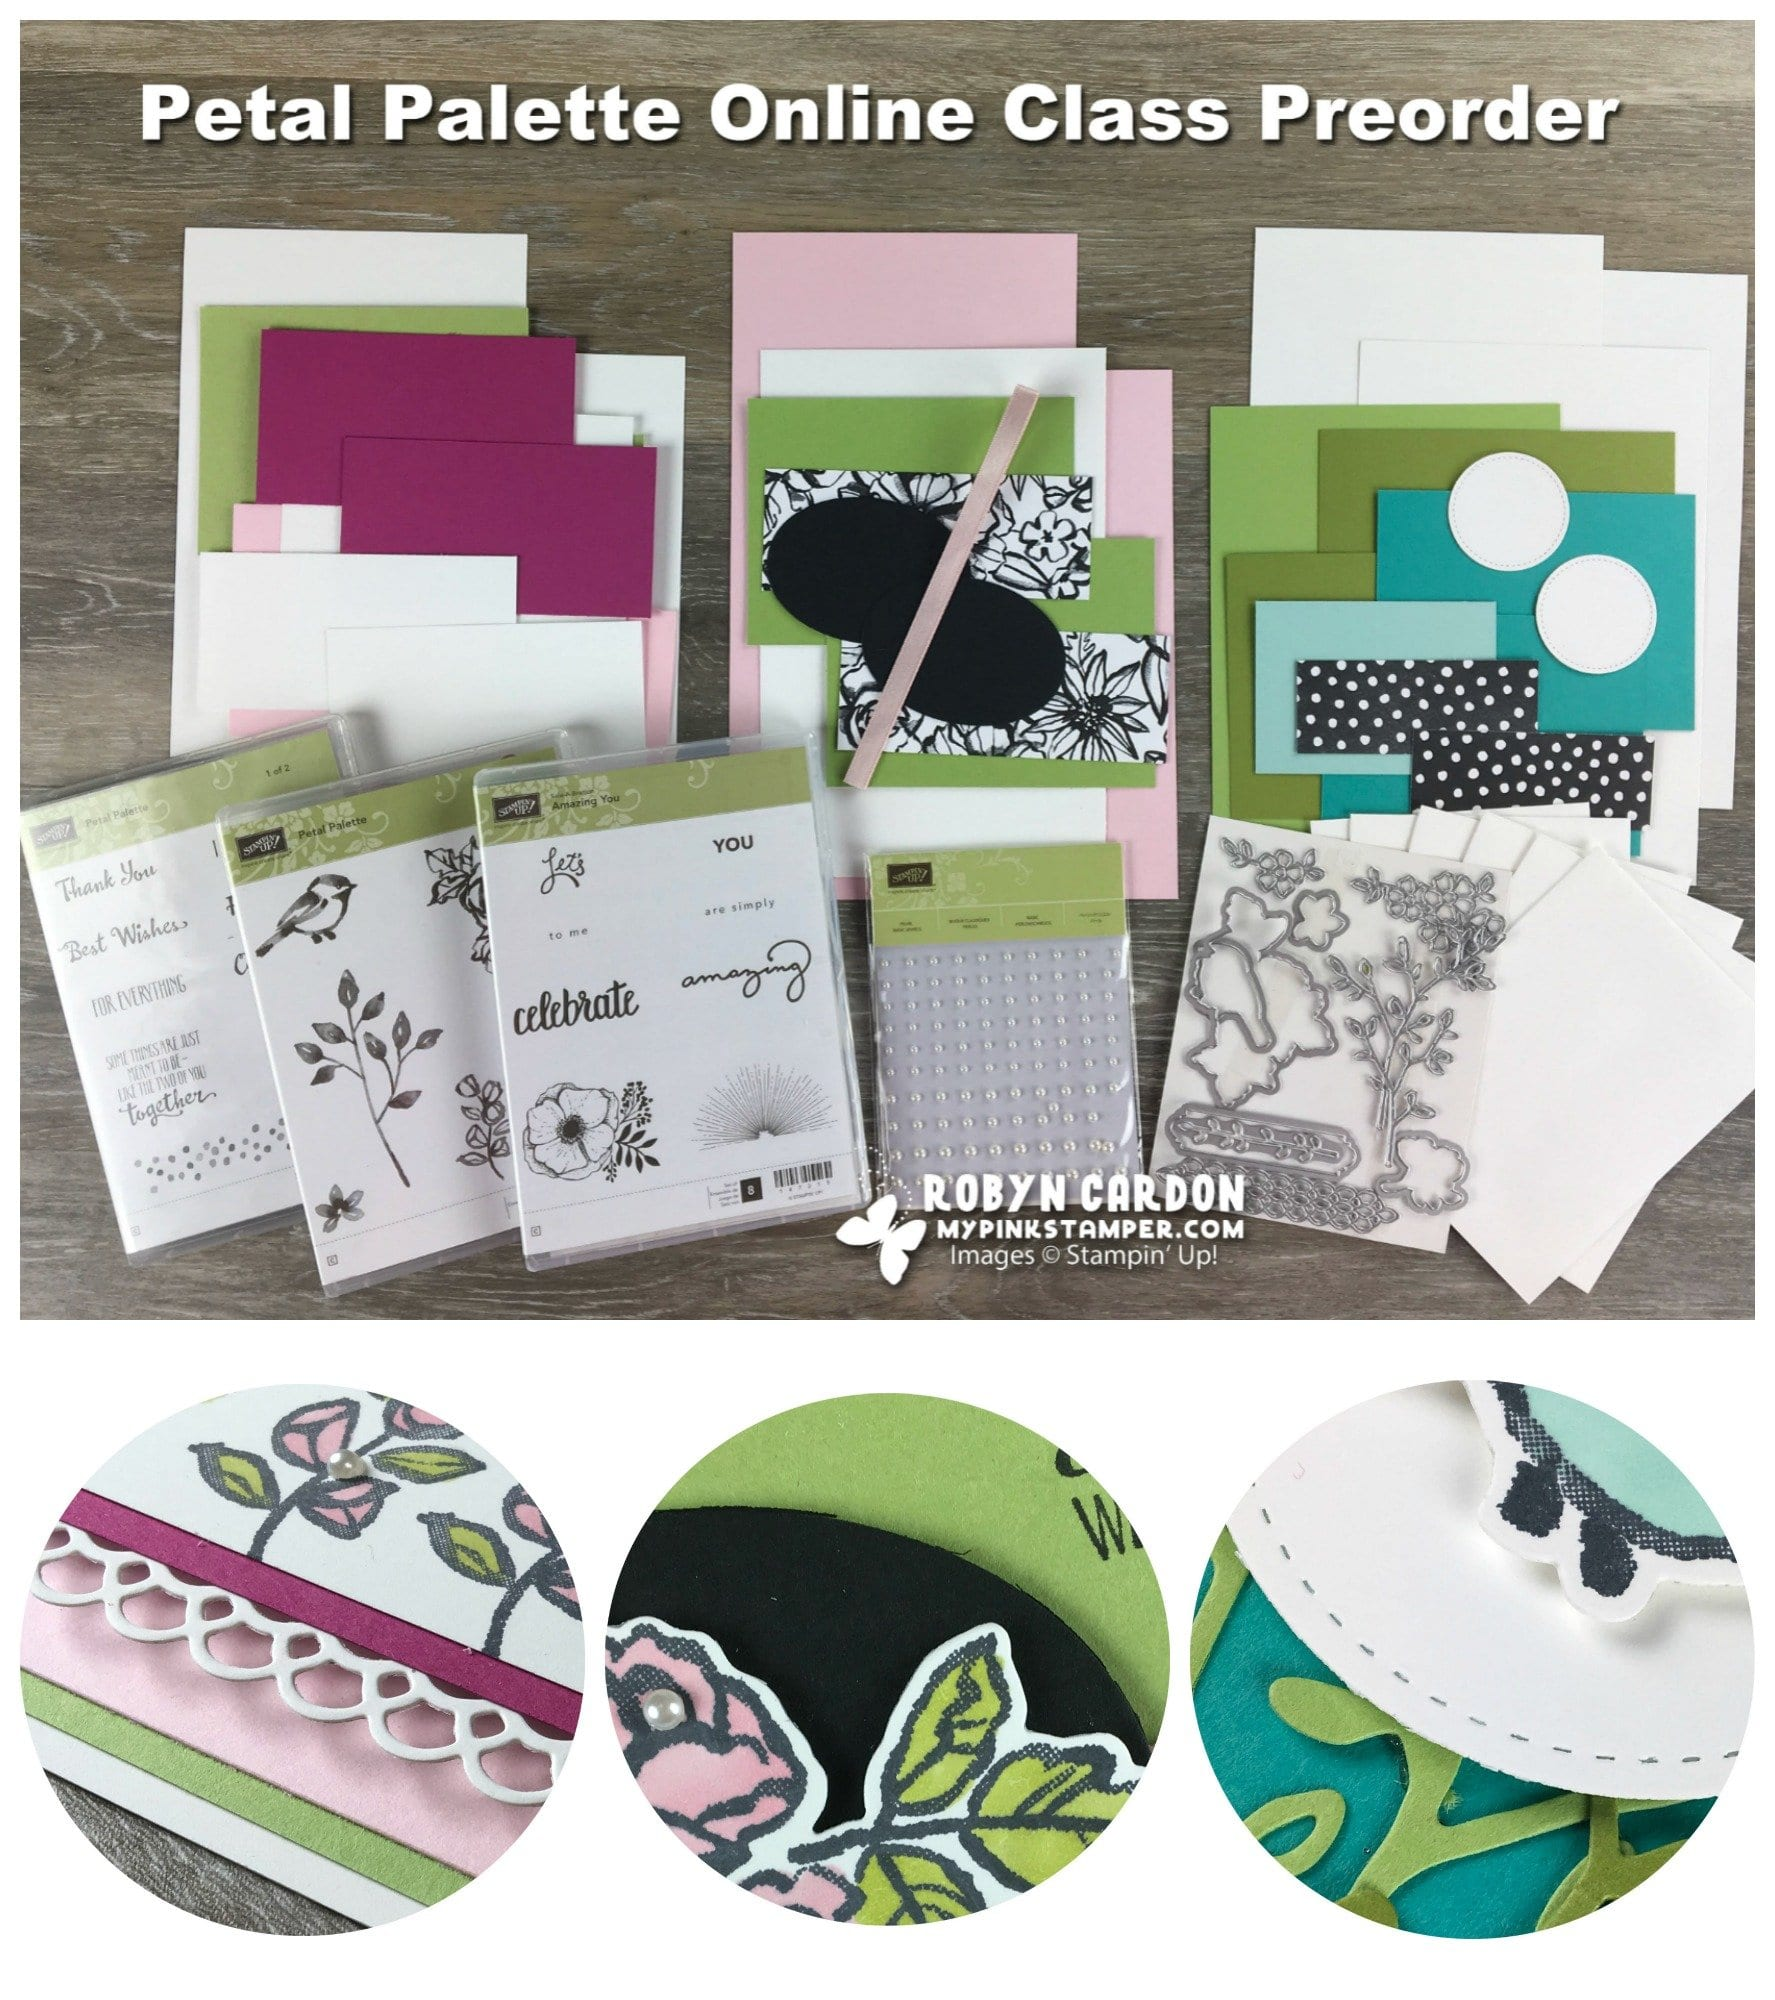 Petal Palette Online Class Preorder